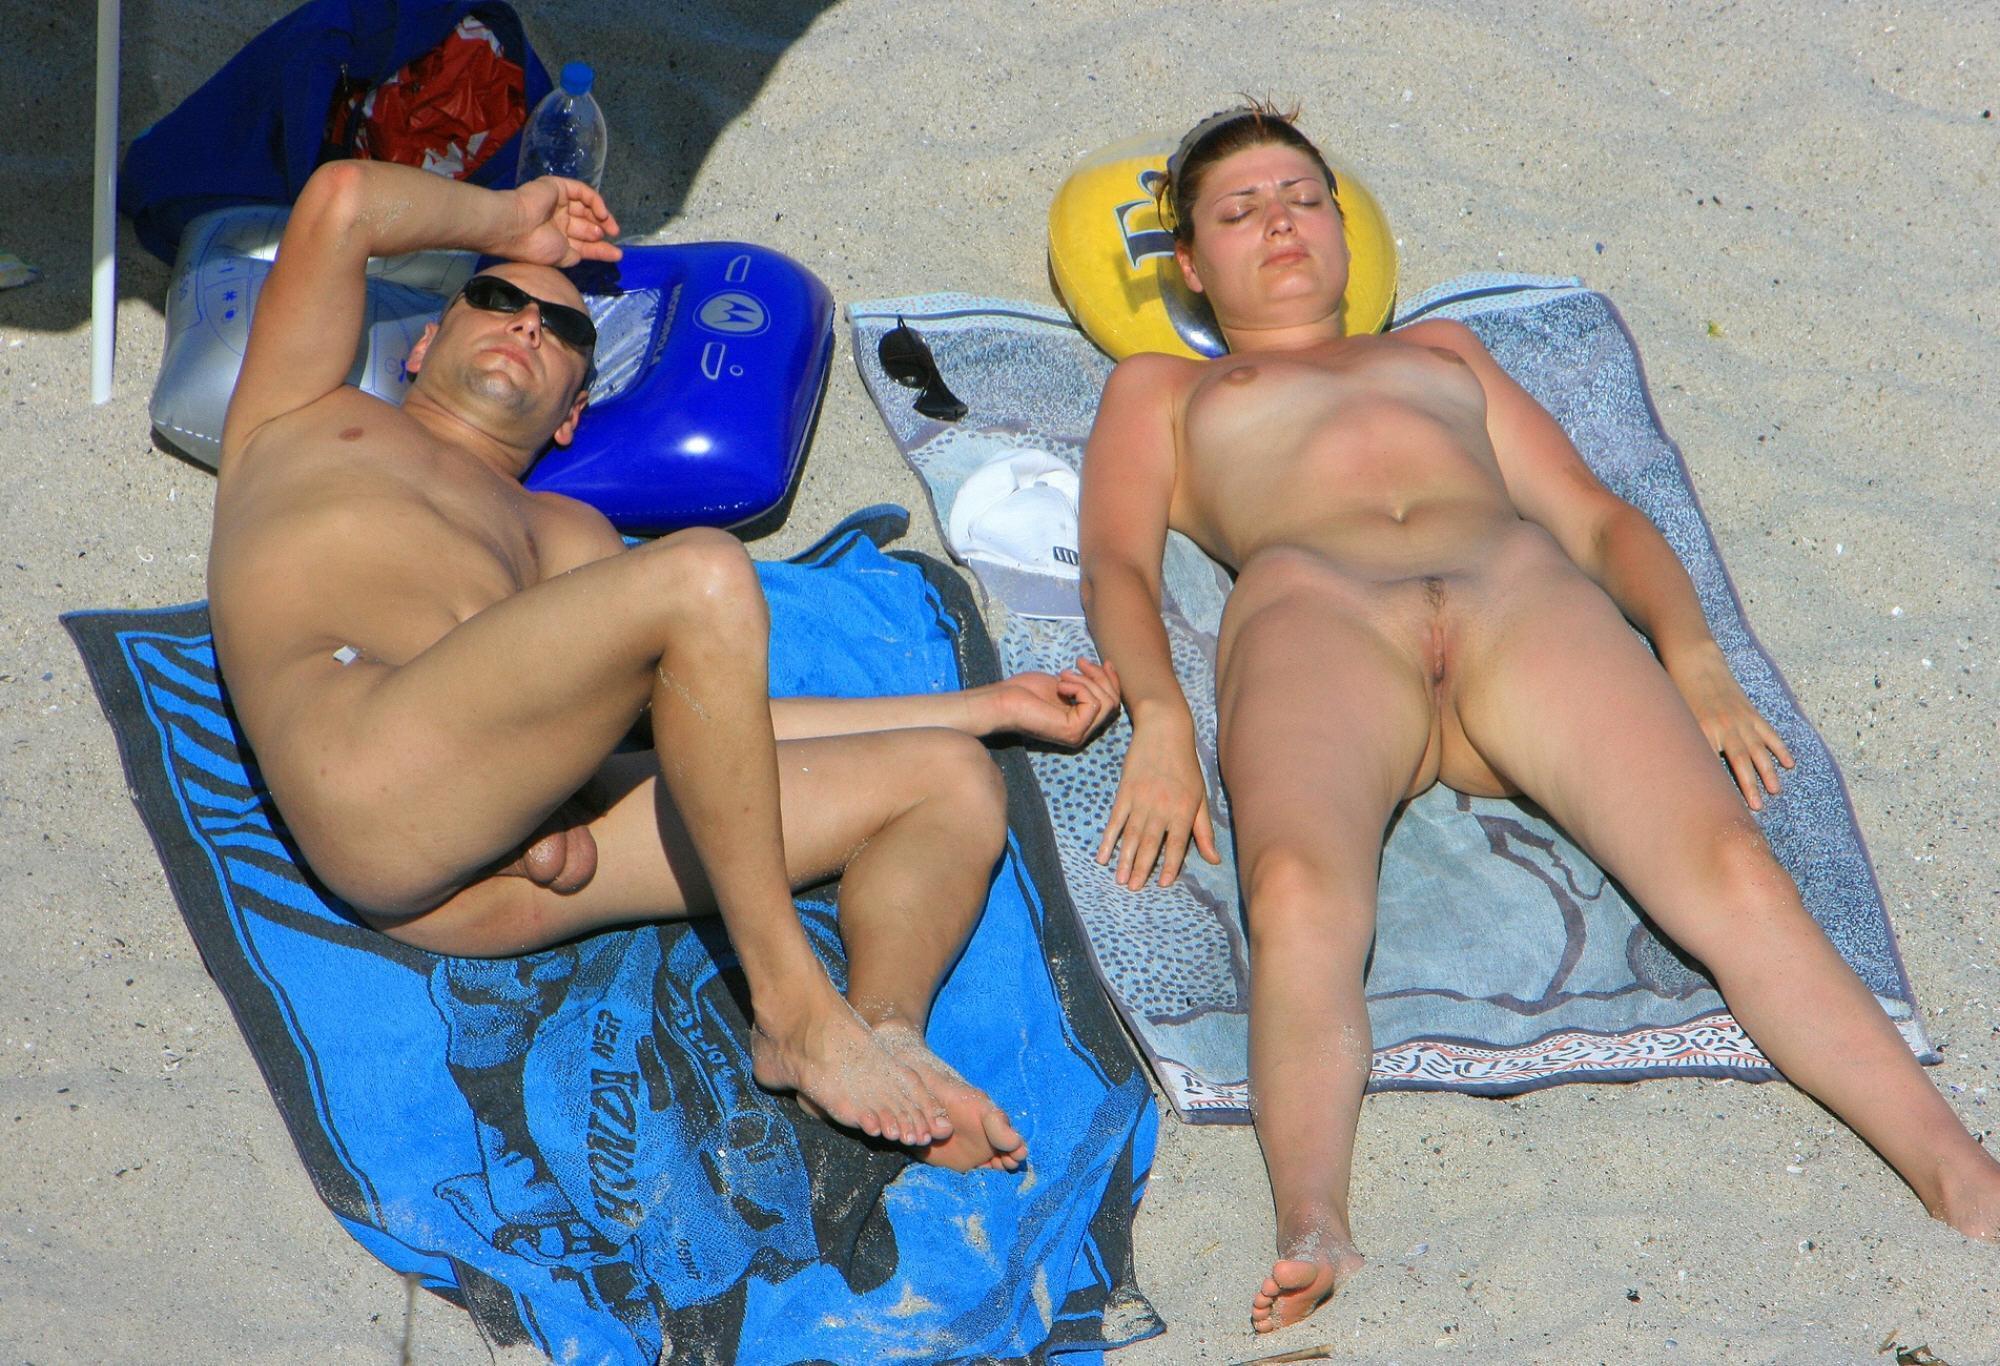 Nudist couple exposed by curious voyeurs